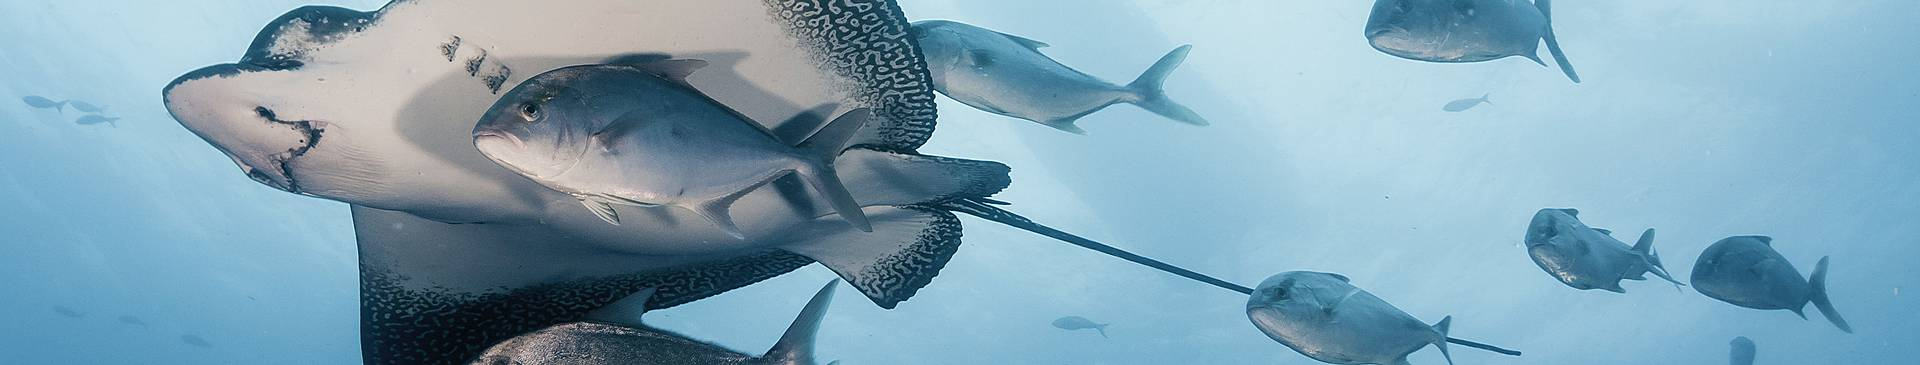 Plongée & Snorkeling en Equateur